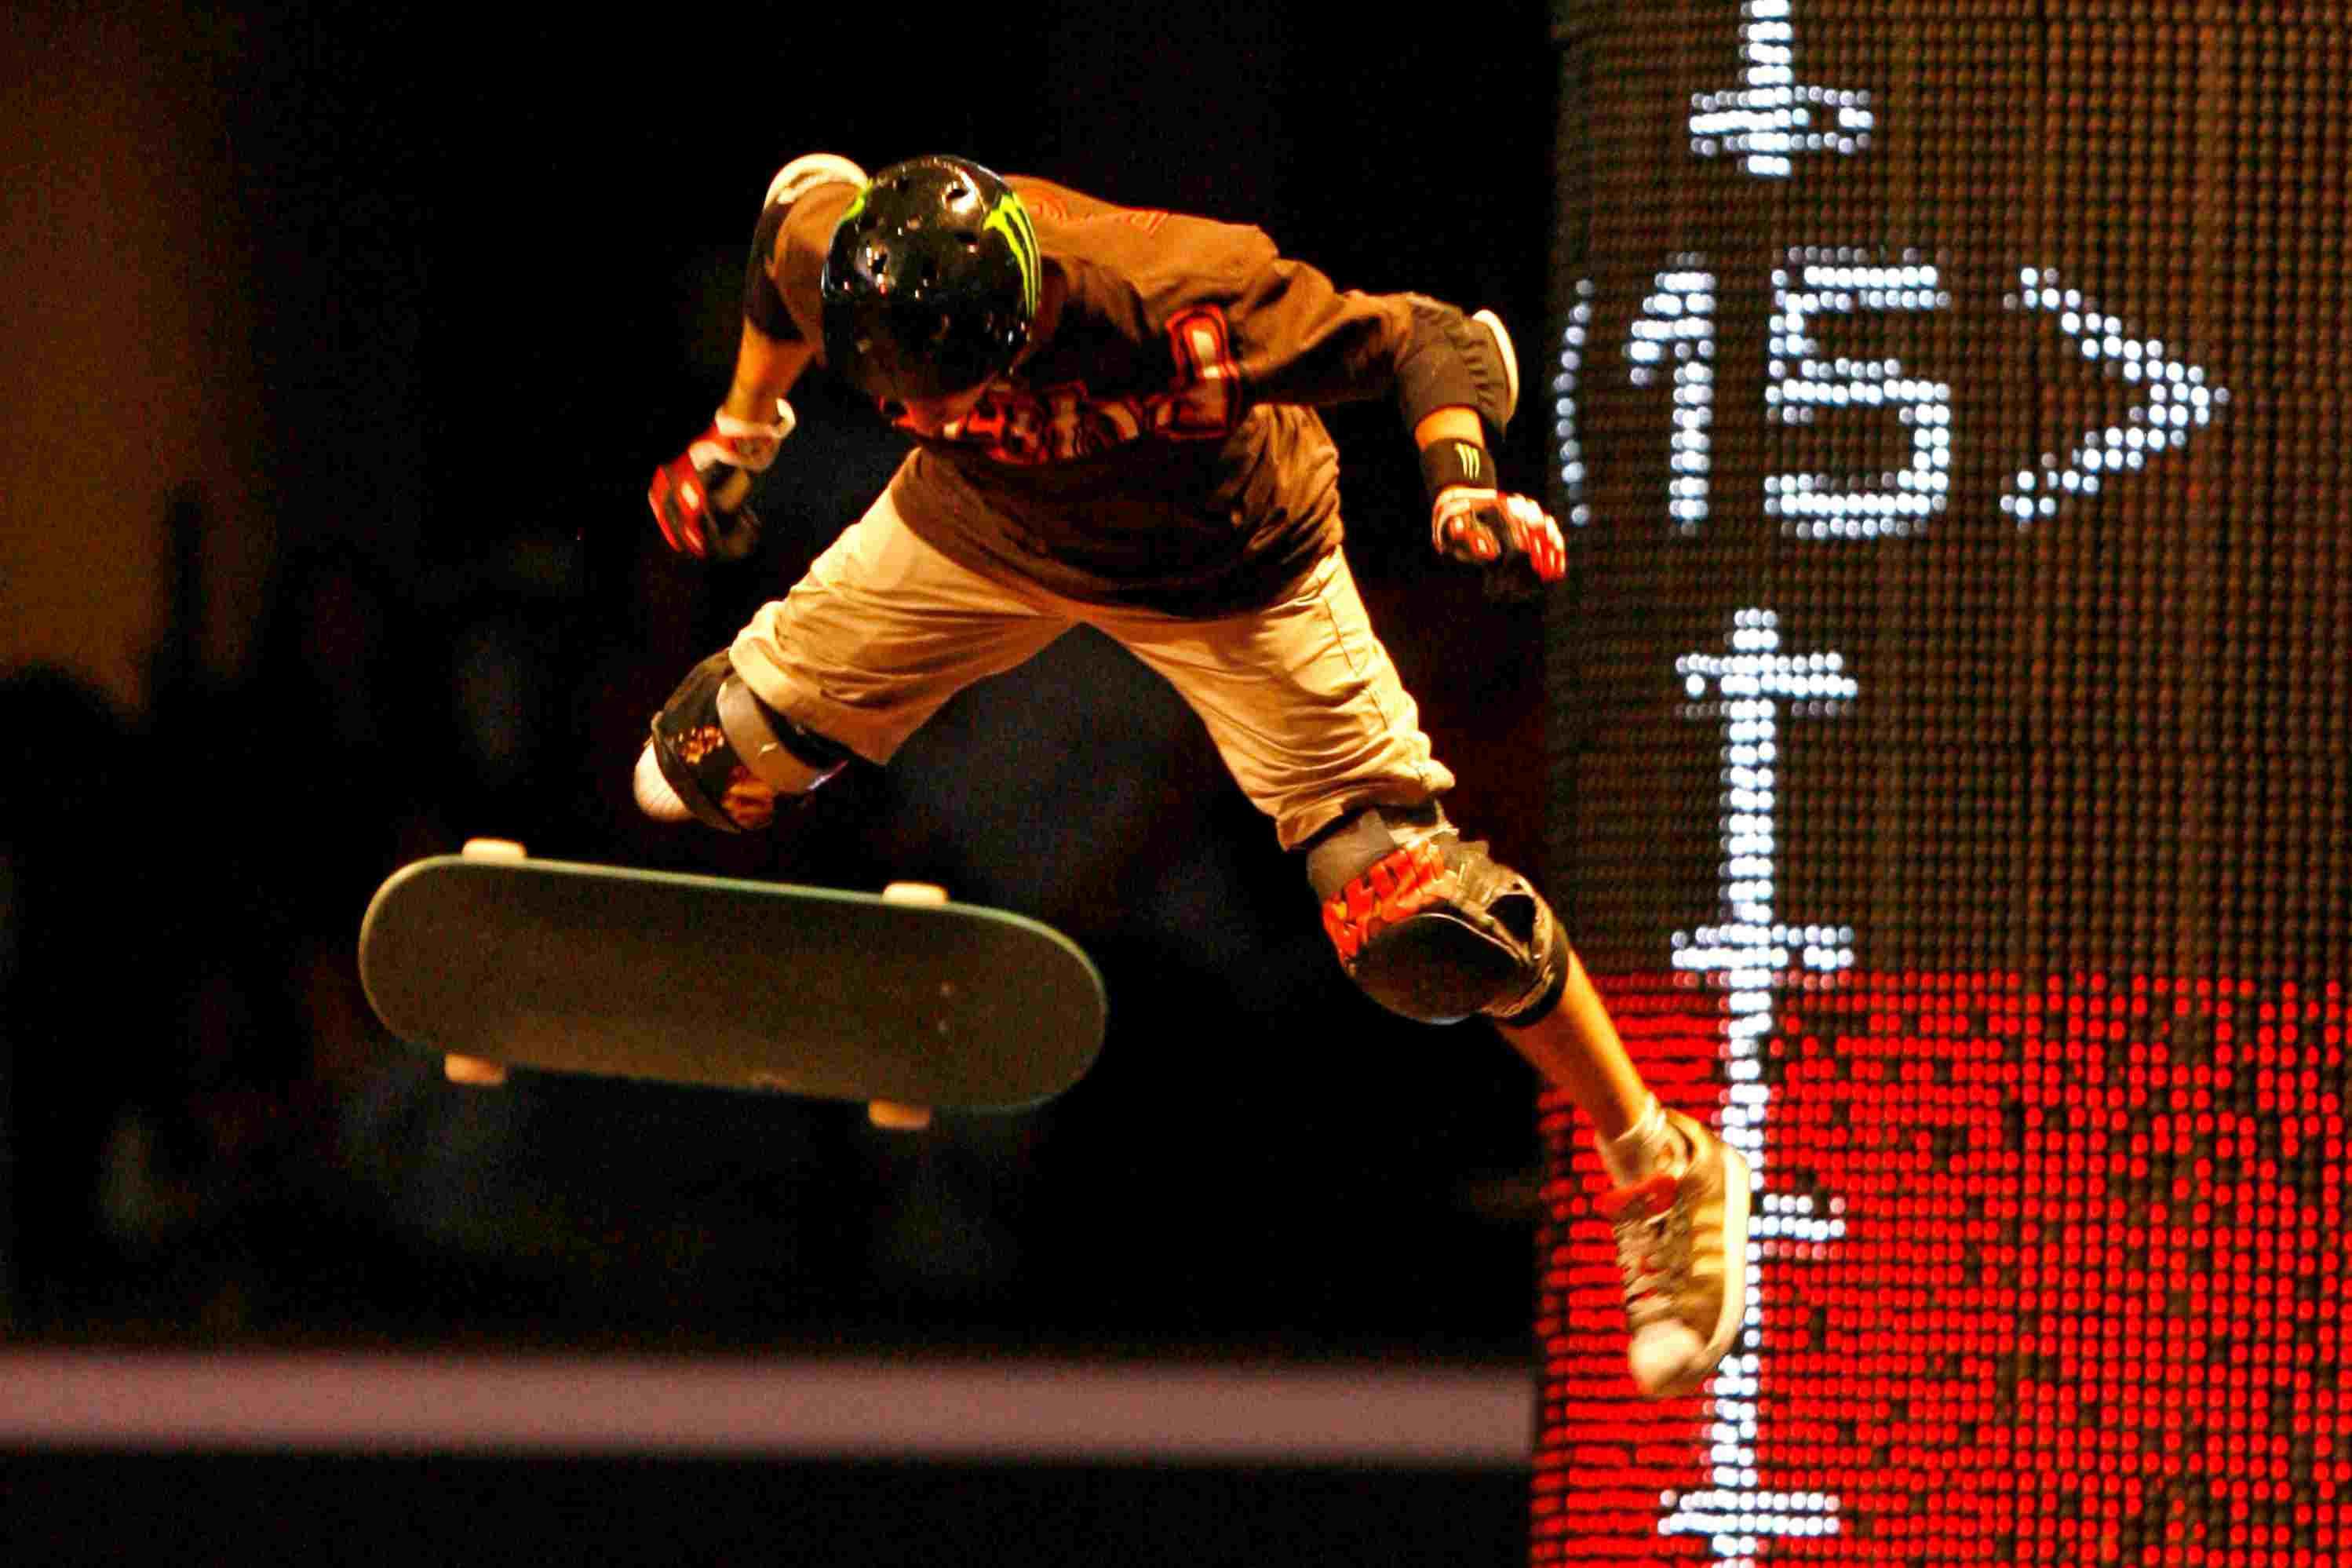 Jake Brown gets big air on his skateboard as gravity pulls him down